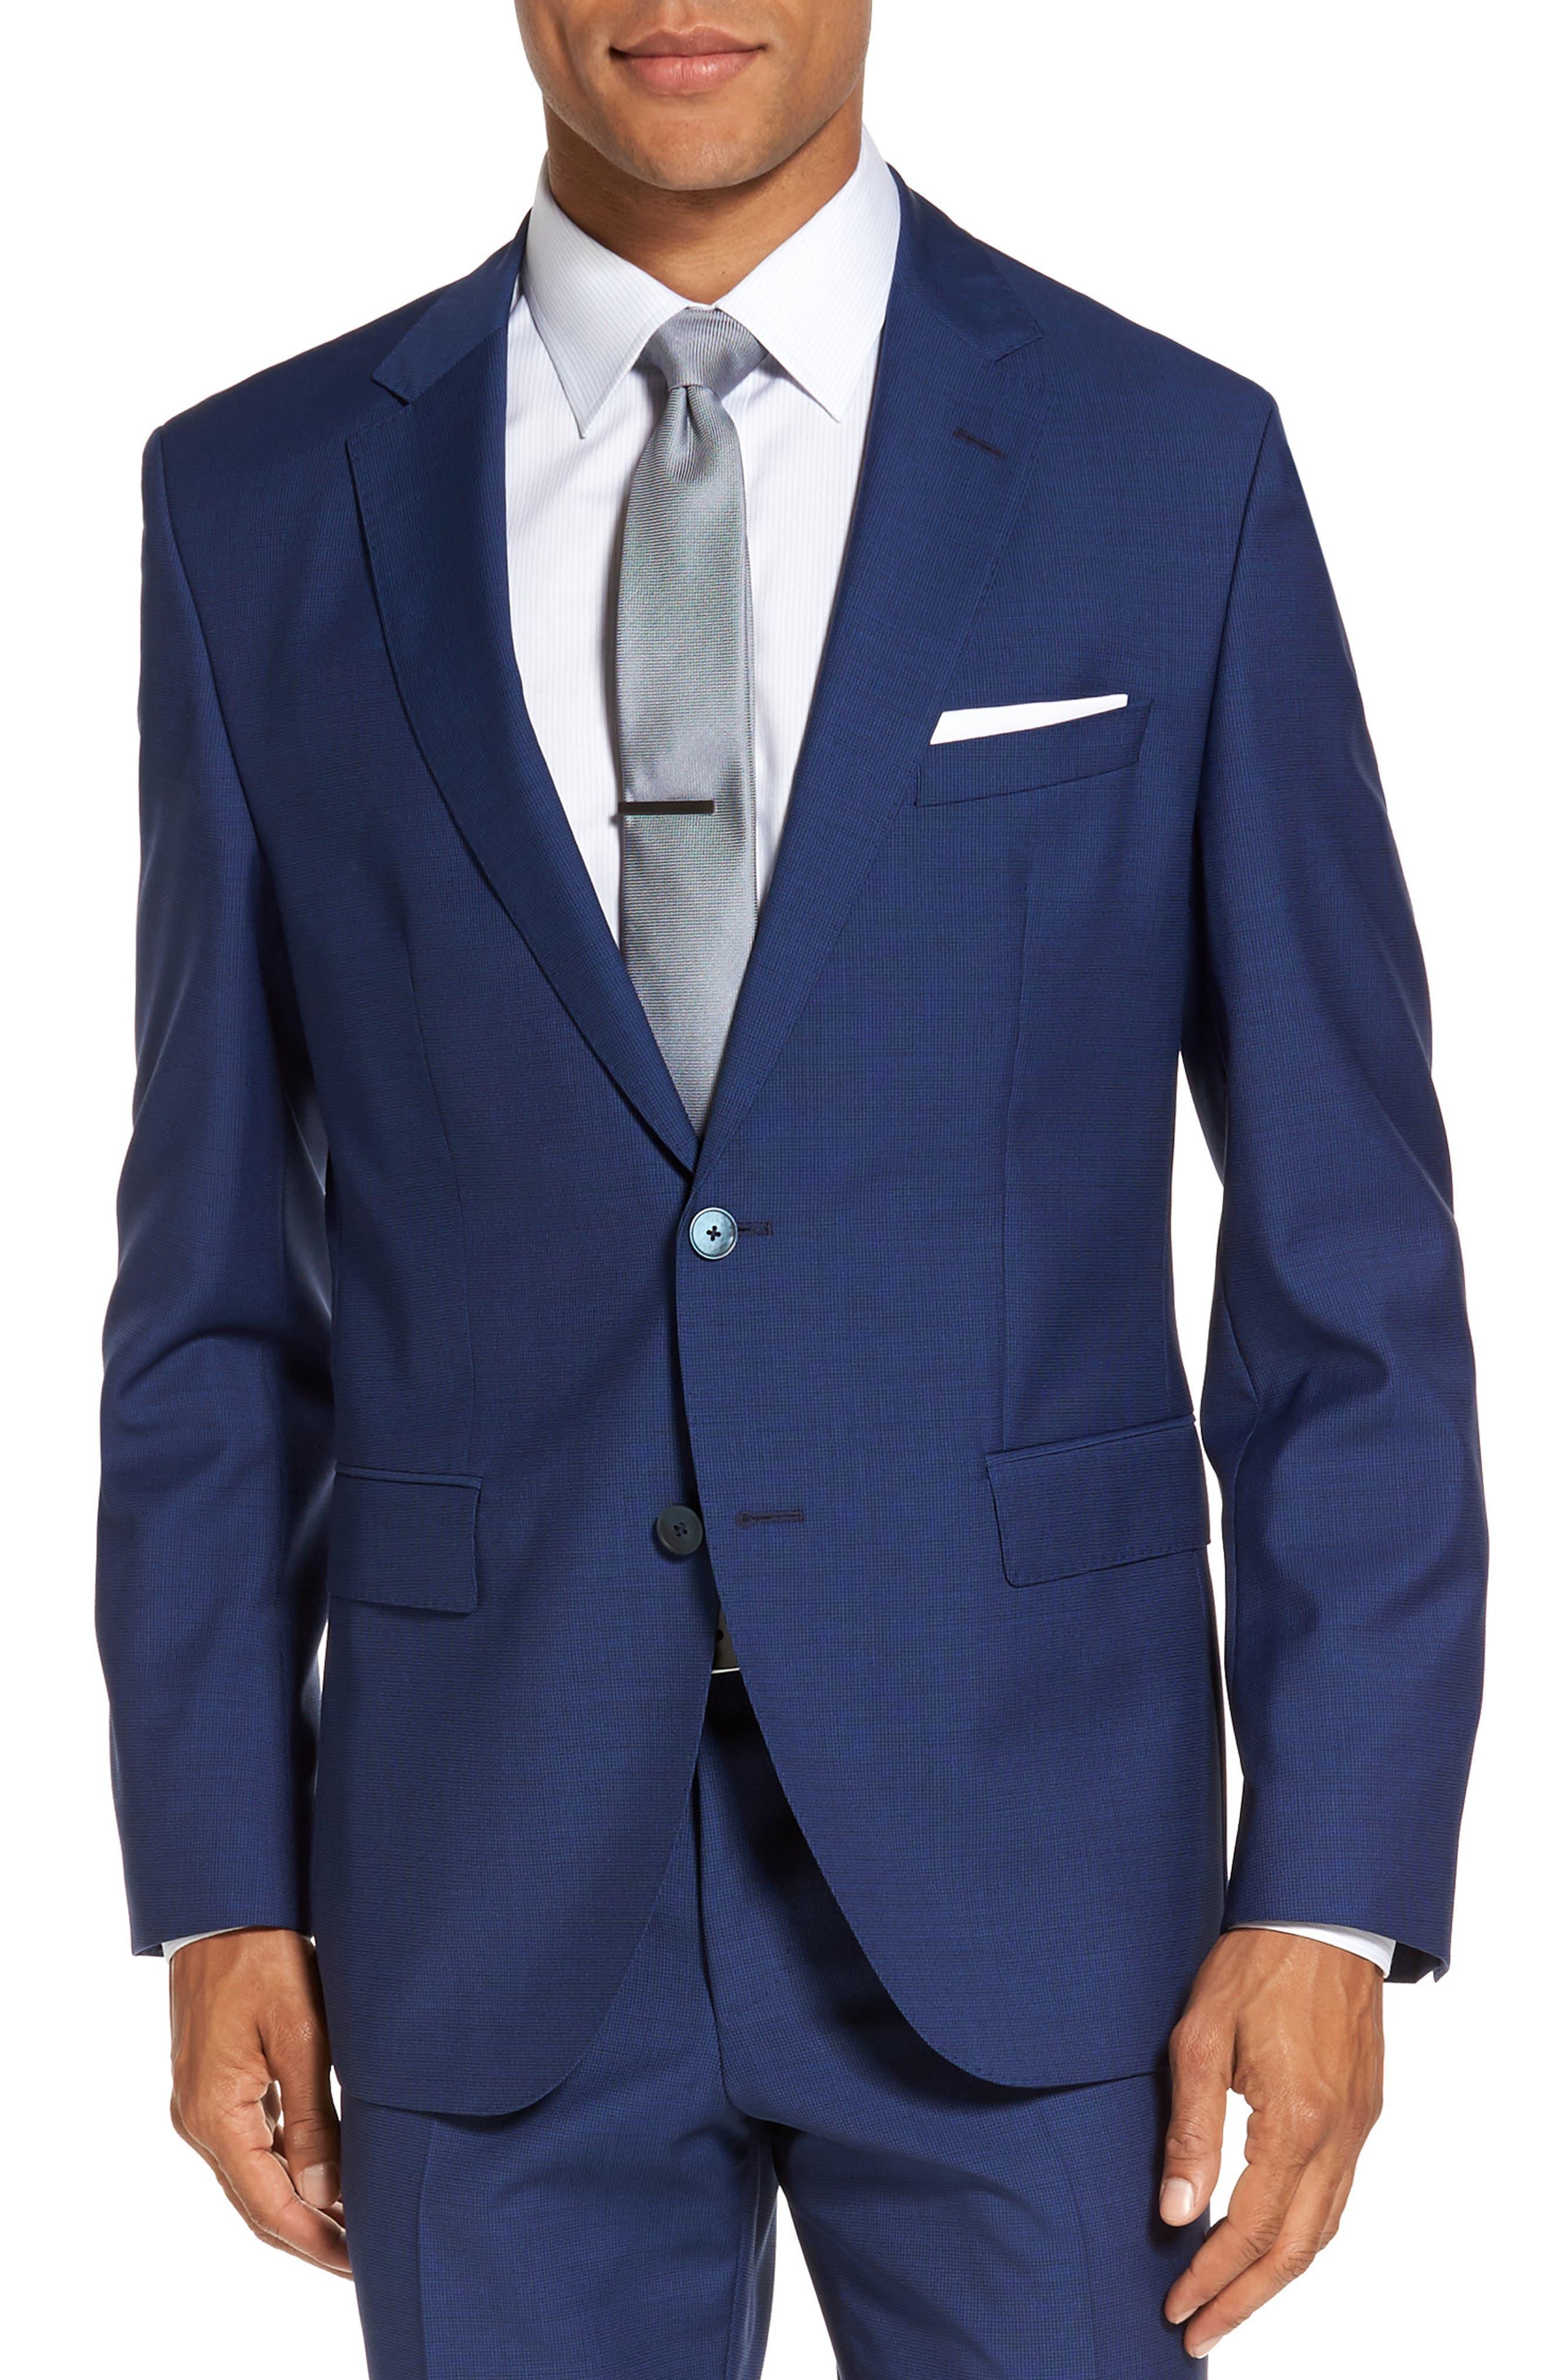 Trim Fit Solid Wool Suit,                             Alternate thumbnail 5, color,                             Bright Blue